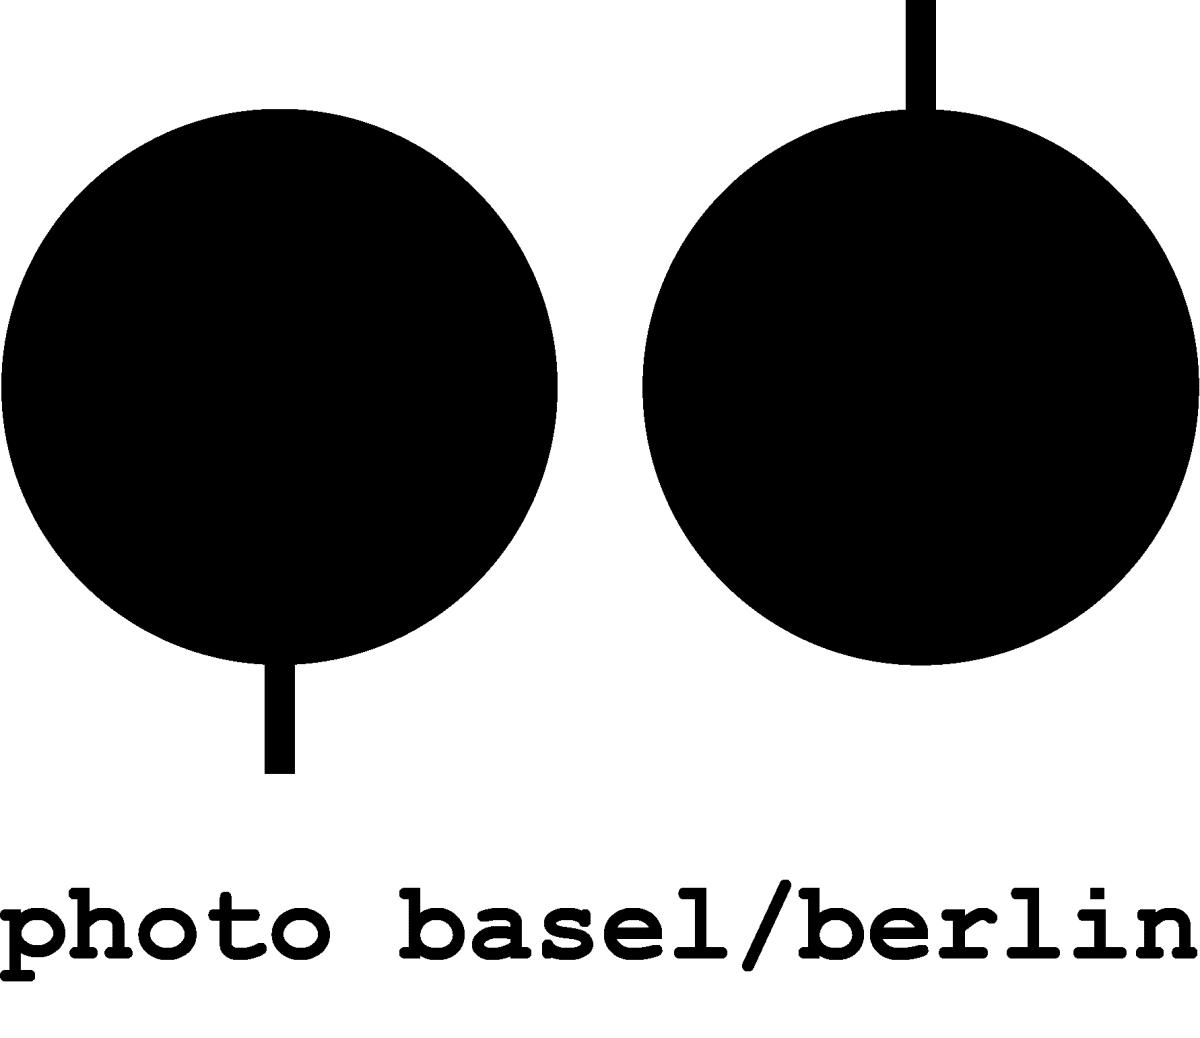 PHOTO BASEL / BERLIN